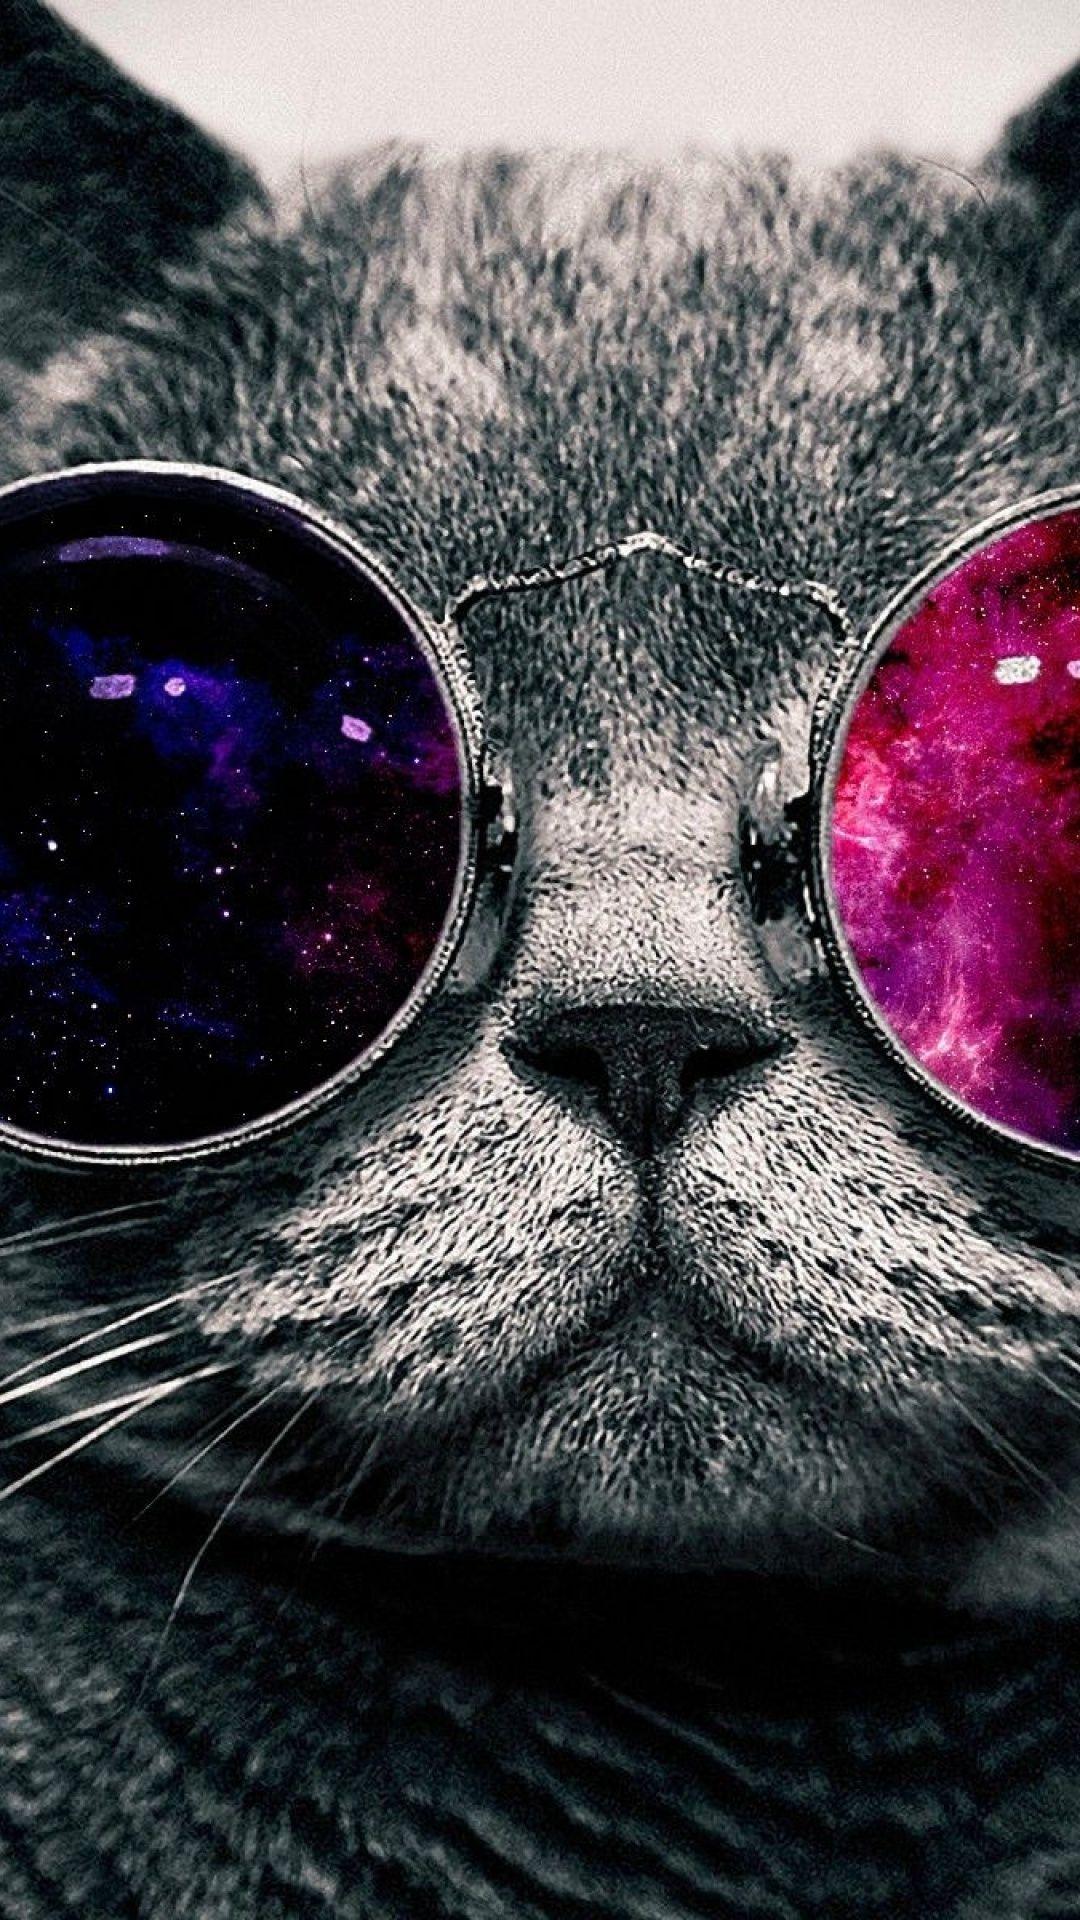 Galaxy Cat Iphone Wallpaper Backgrounds Wallpapers Pinterest